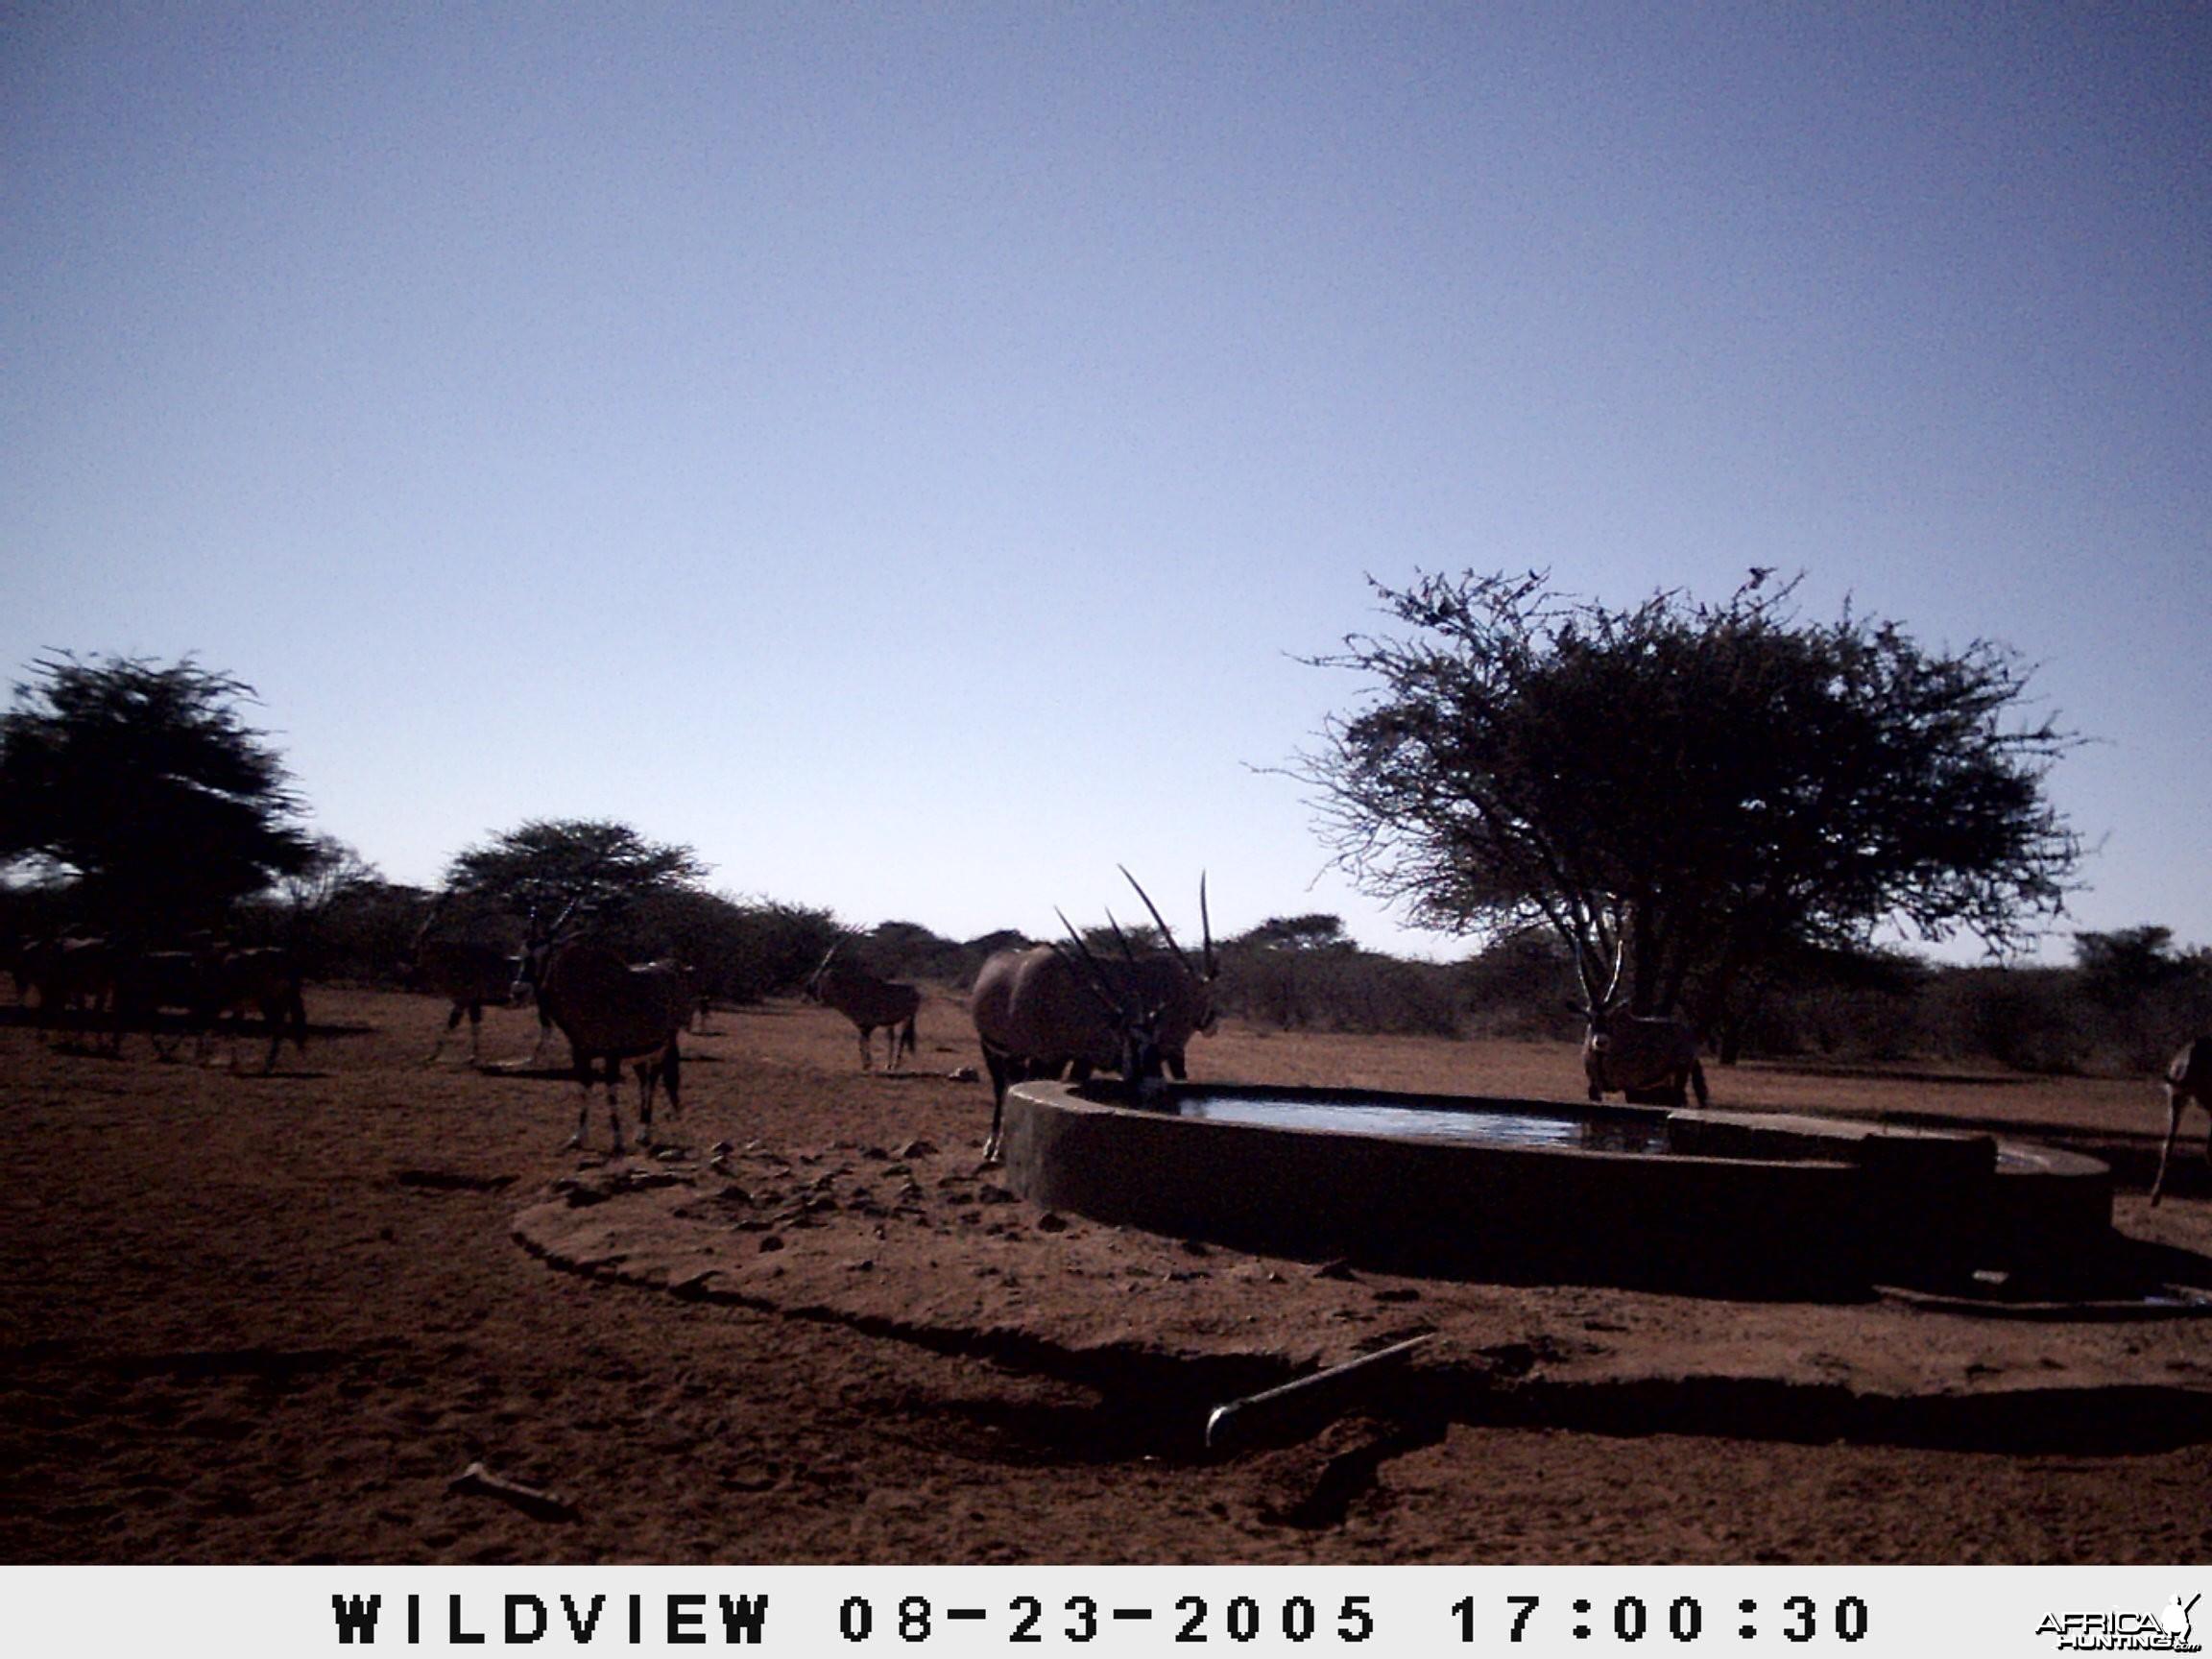 Gemsboks, Namibia